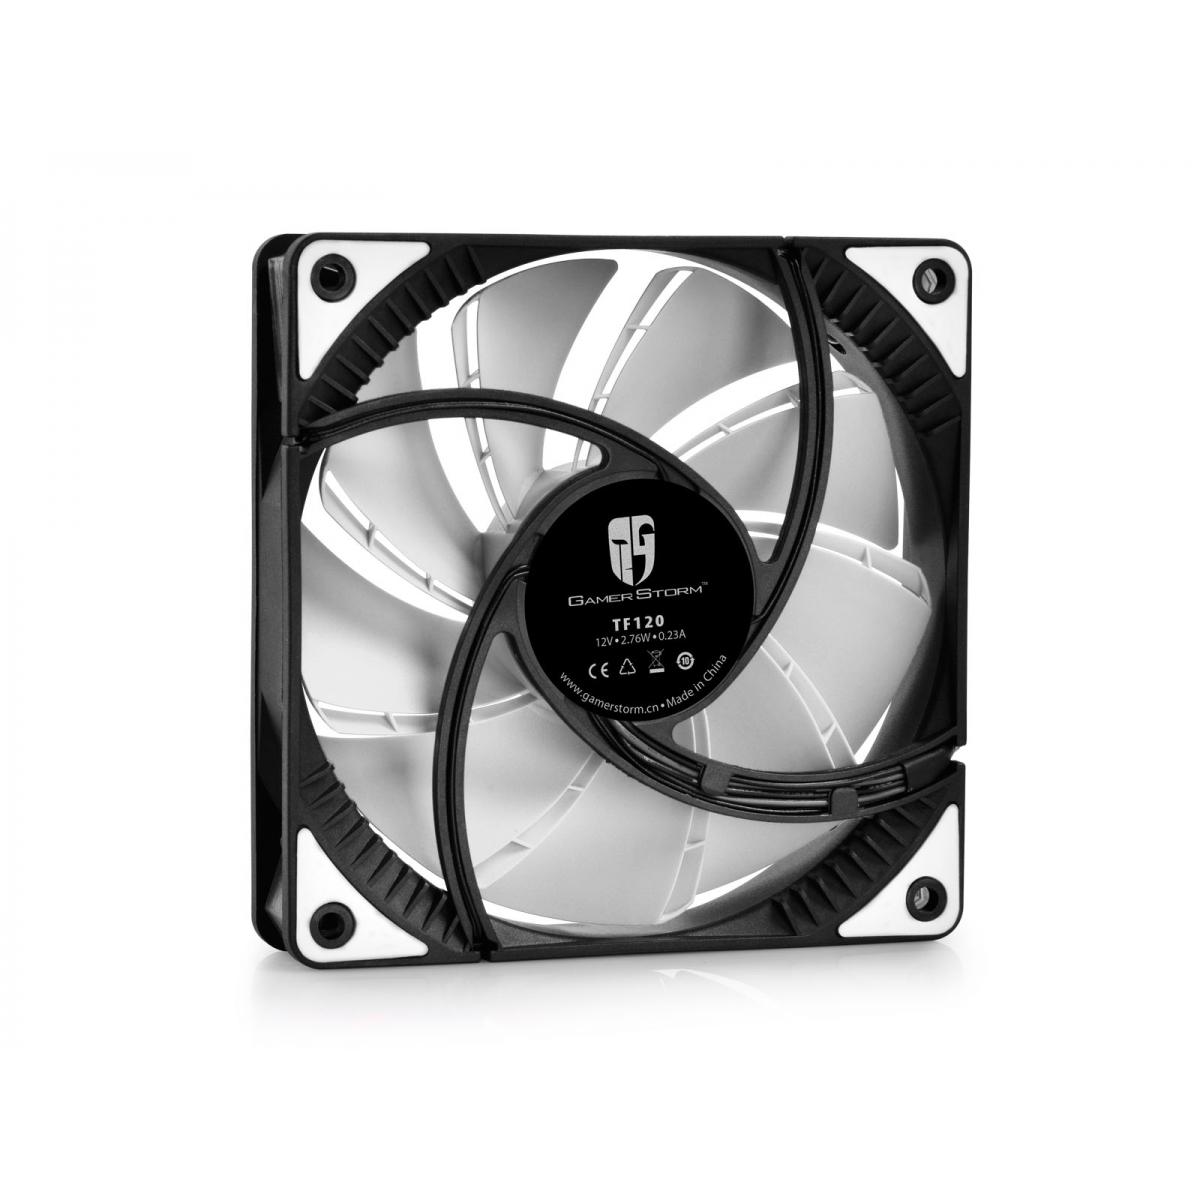 Cooler para Gabinete Gamer Storm Deepcool, LED White 120mm, DPGS-FTF-TF120WW